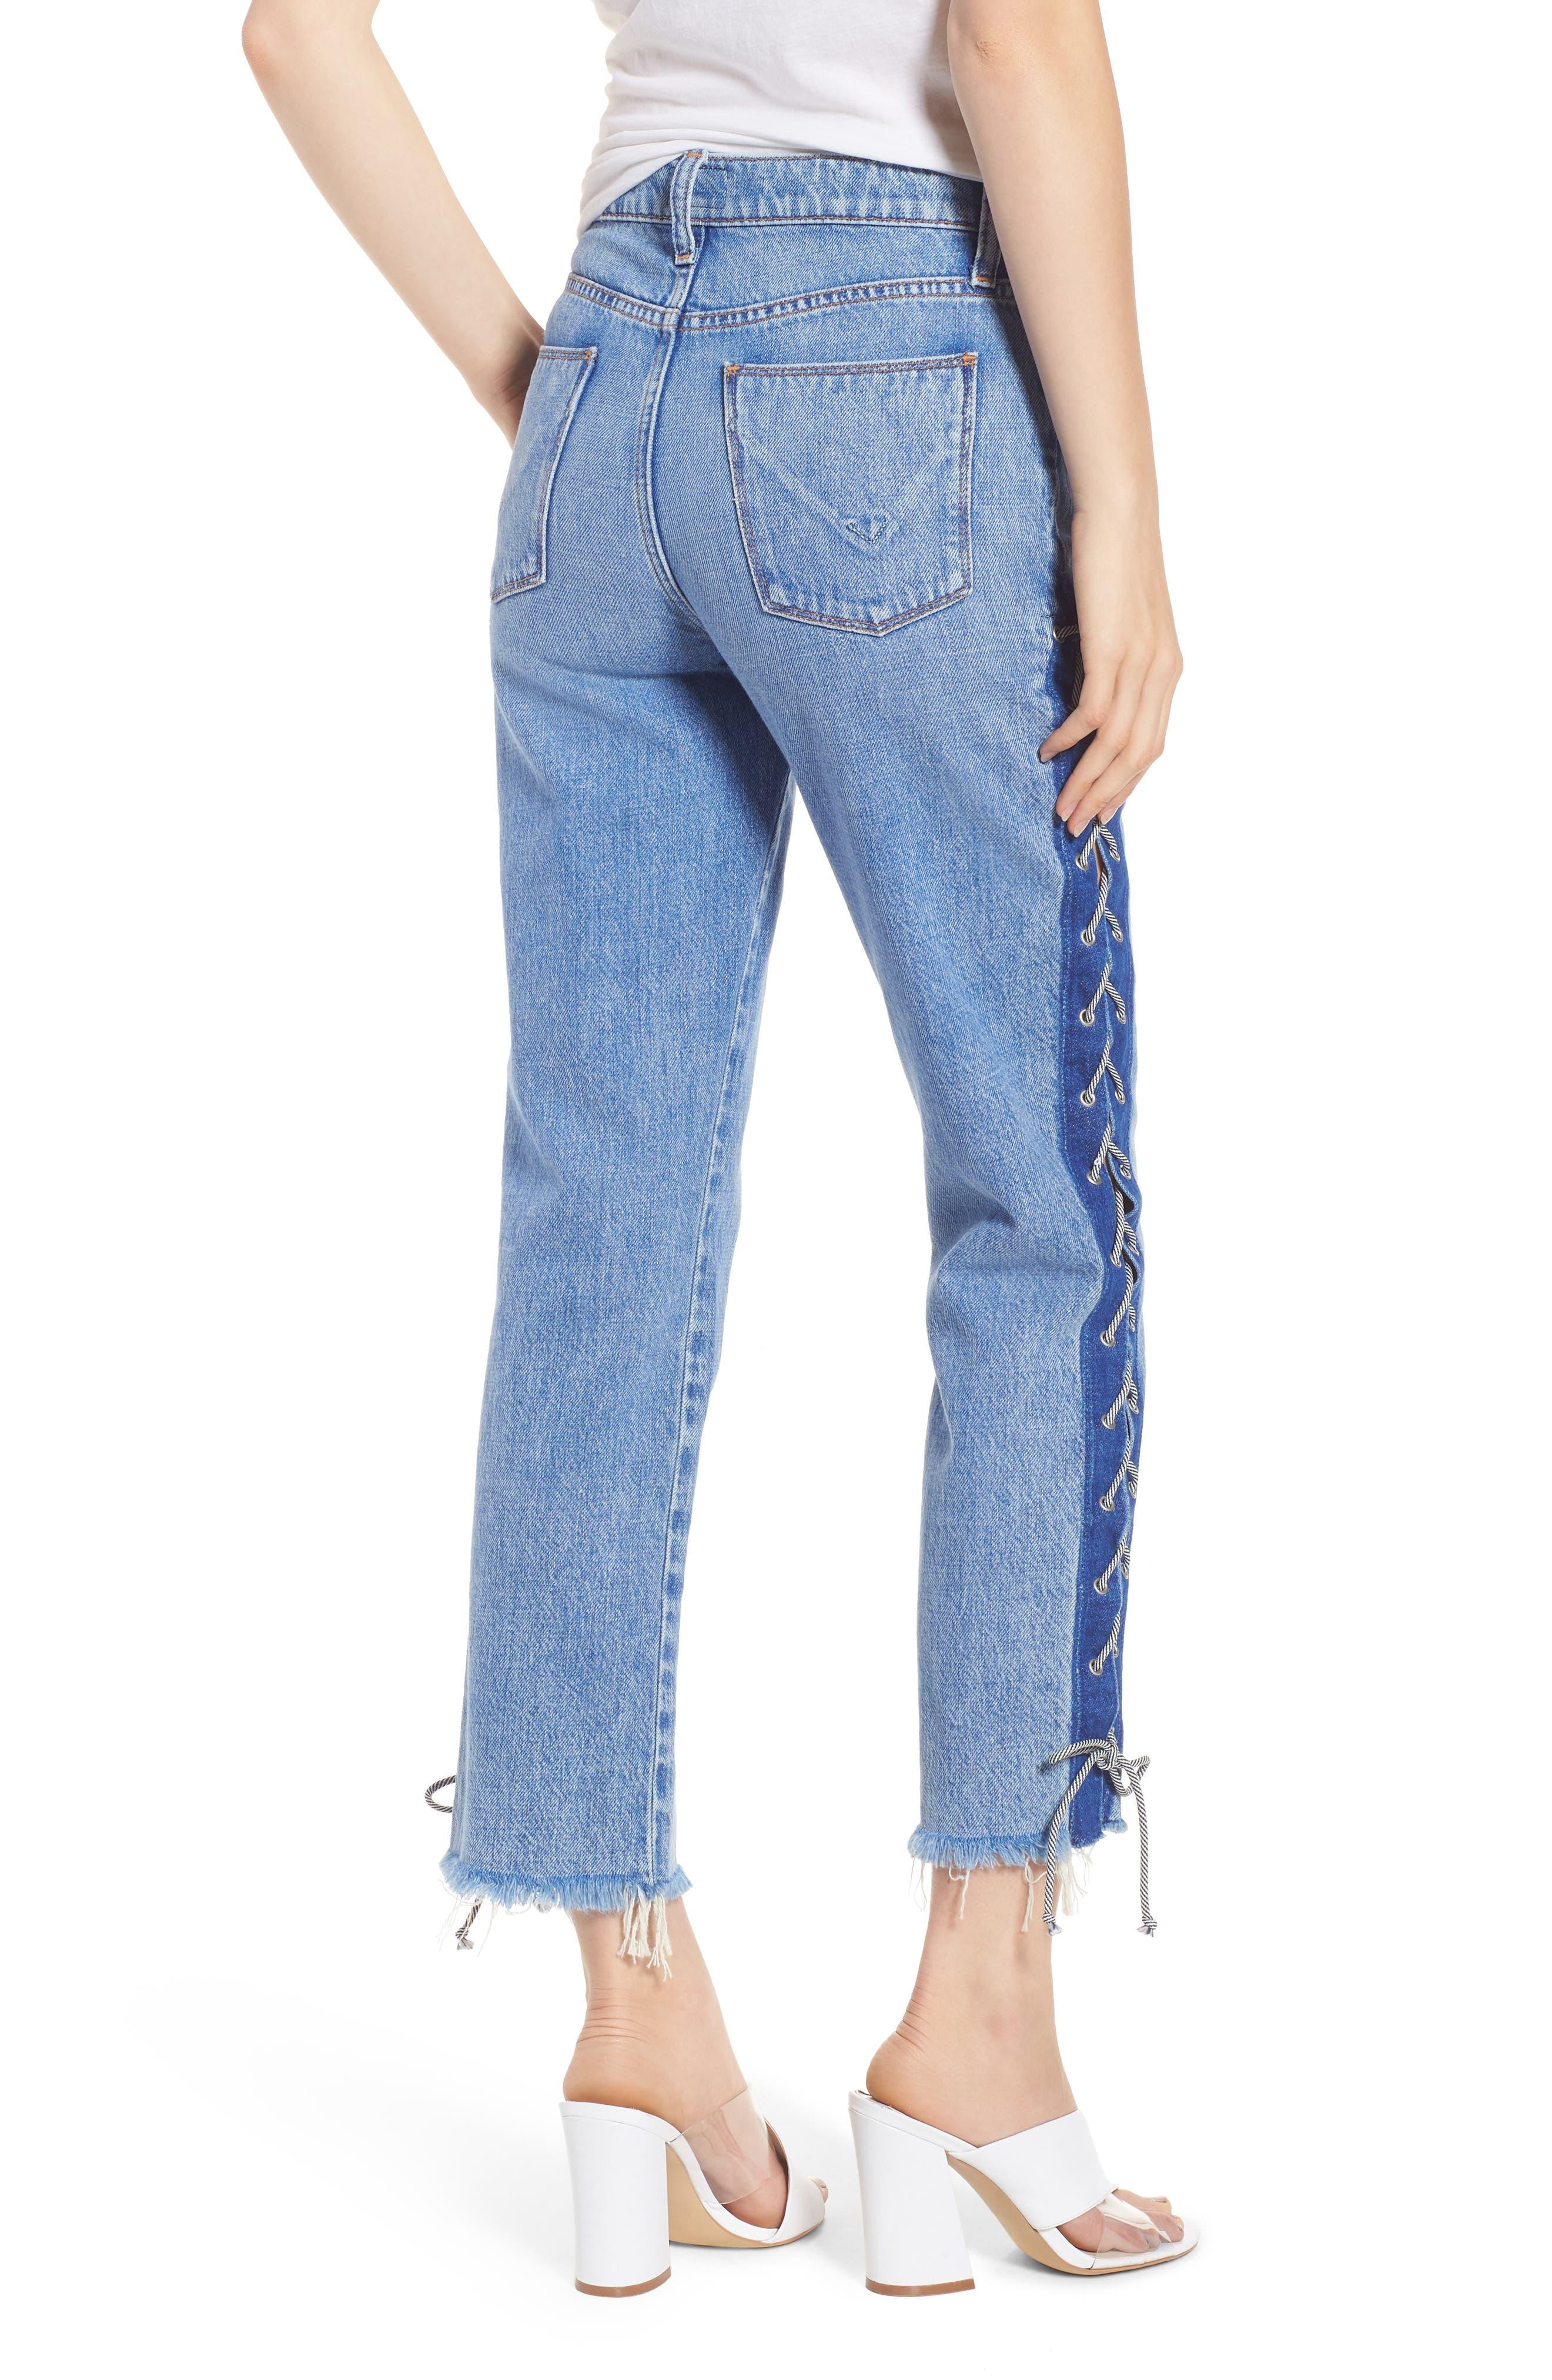 Zoeey High Waist Crop Straight Leg Jeans,                             Alternate thumbnail 2, color,                             460